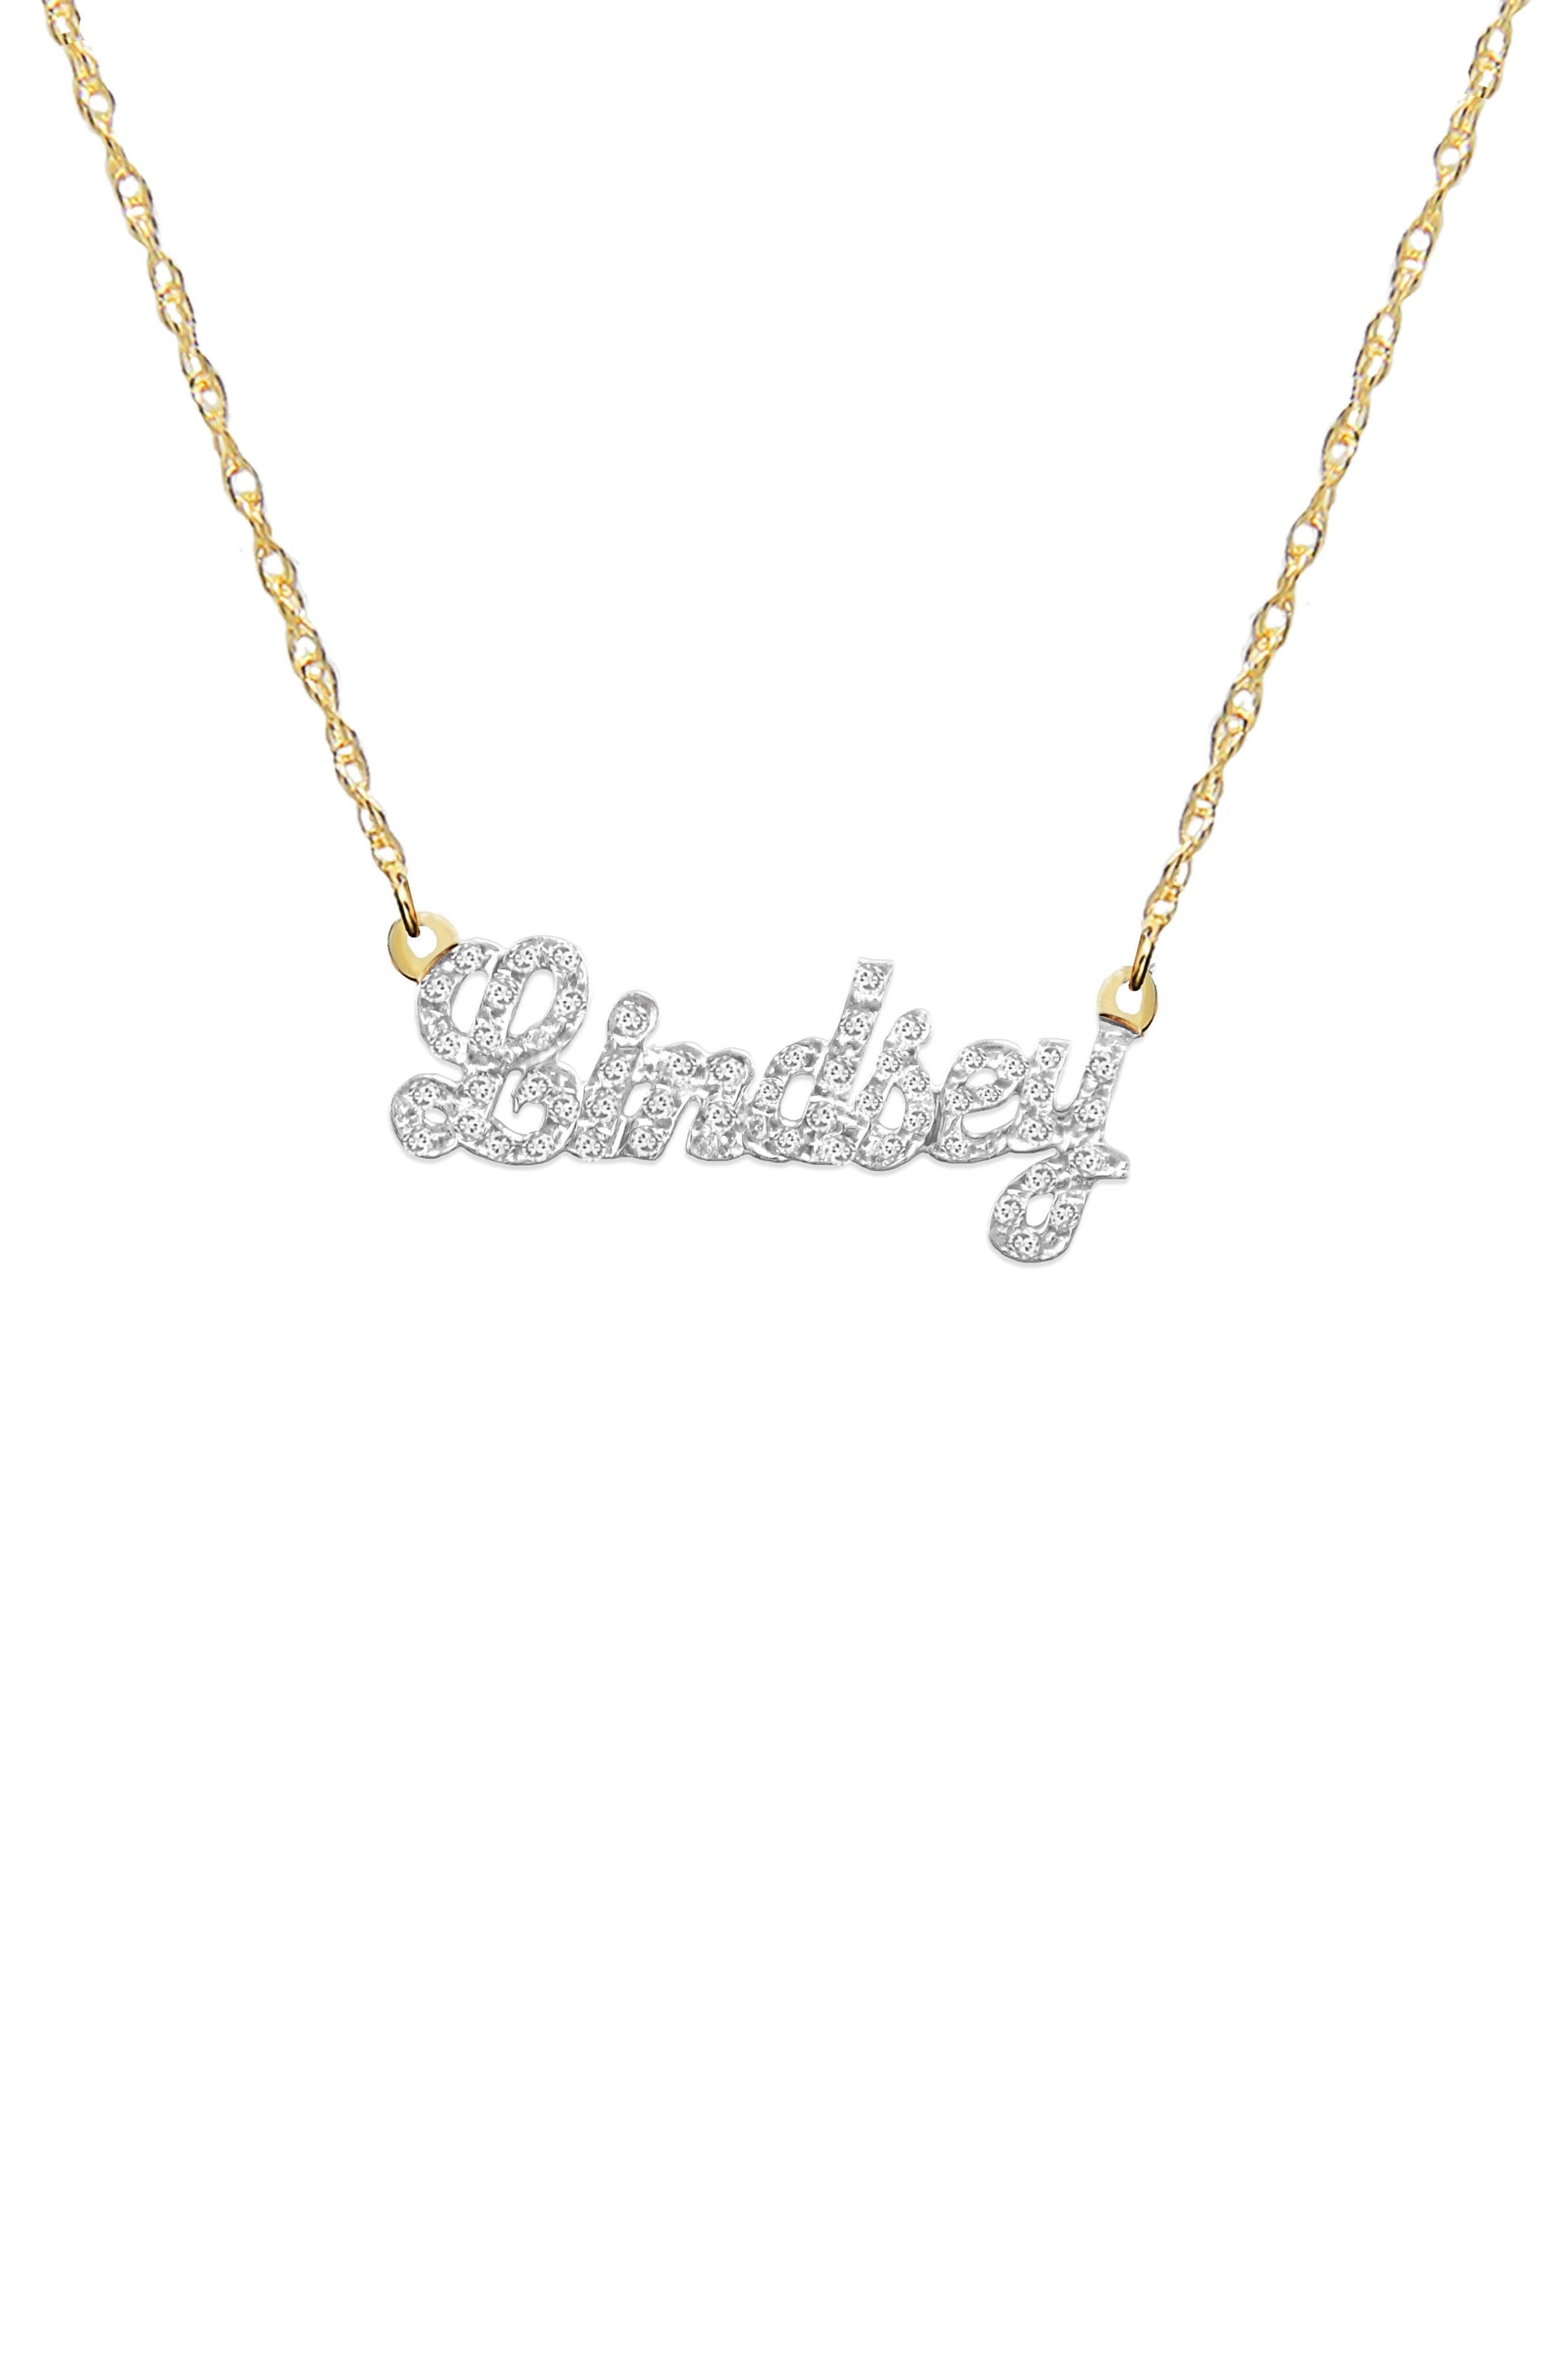 Main Image - Jane Basch Personalized Nameplate Diamond Pendant Necklace